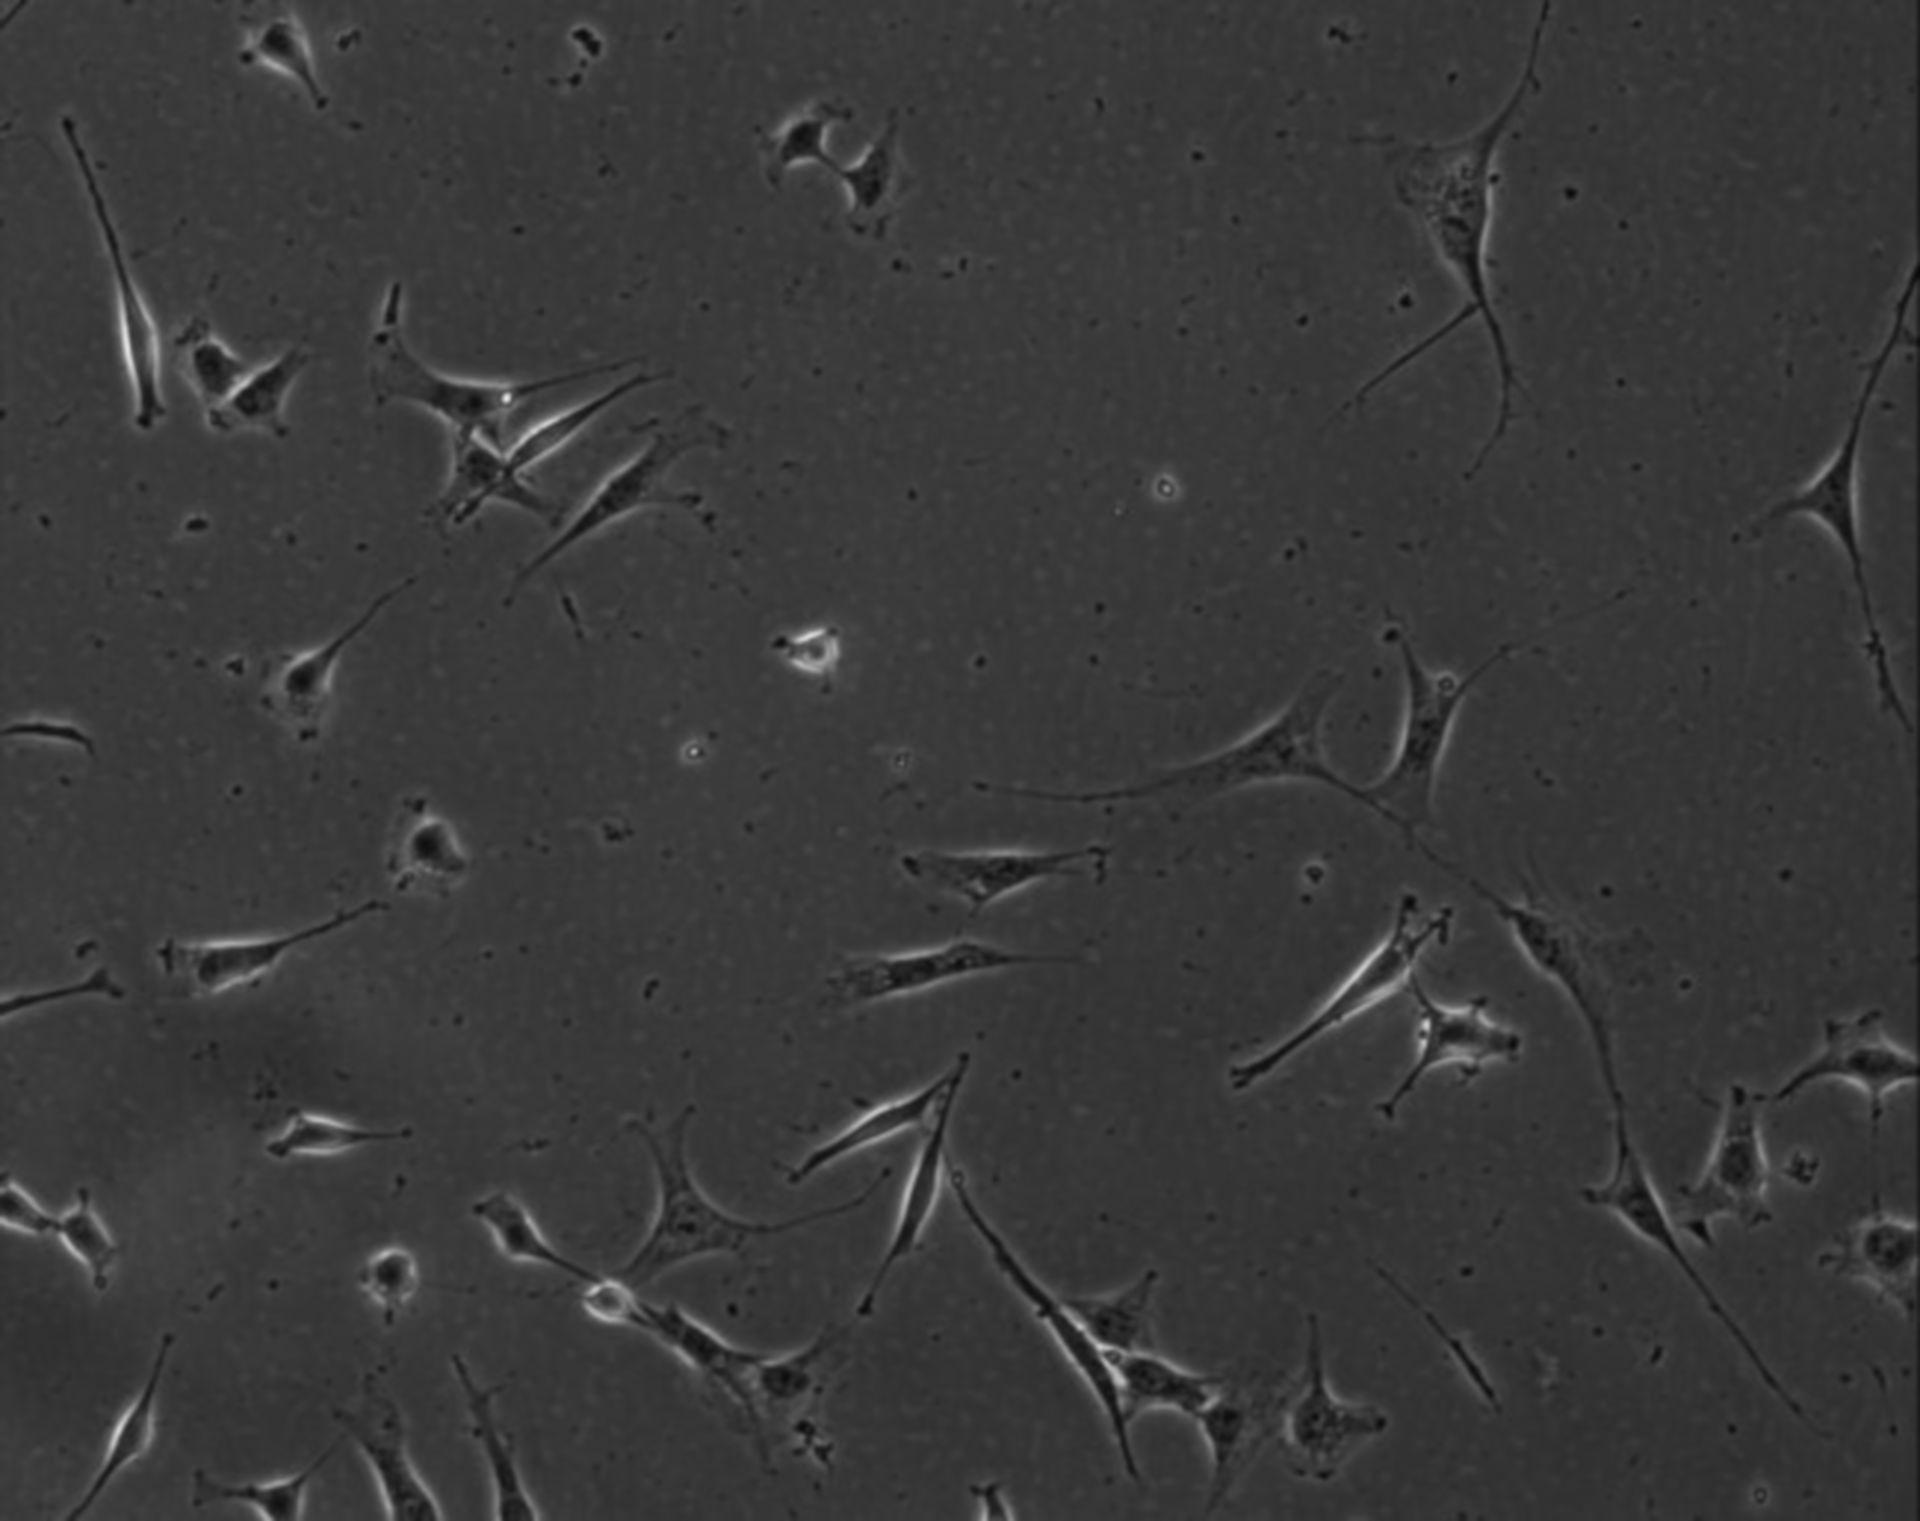 Mus musculus (parte matrice extracellulare) - CIL:9013